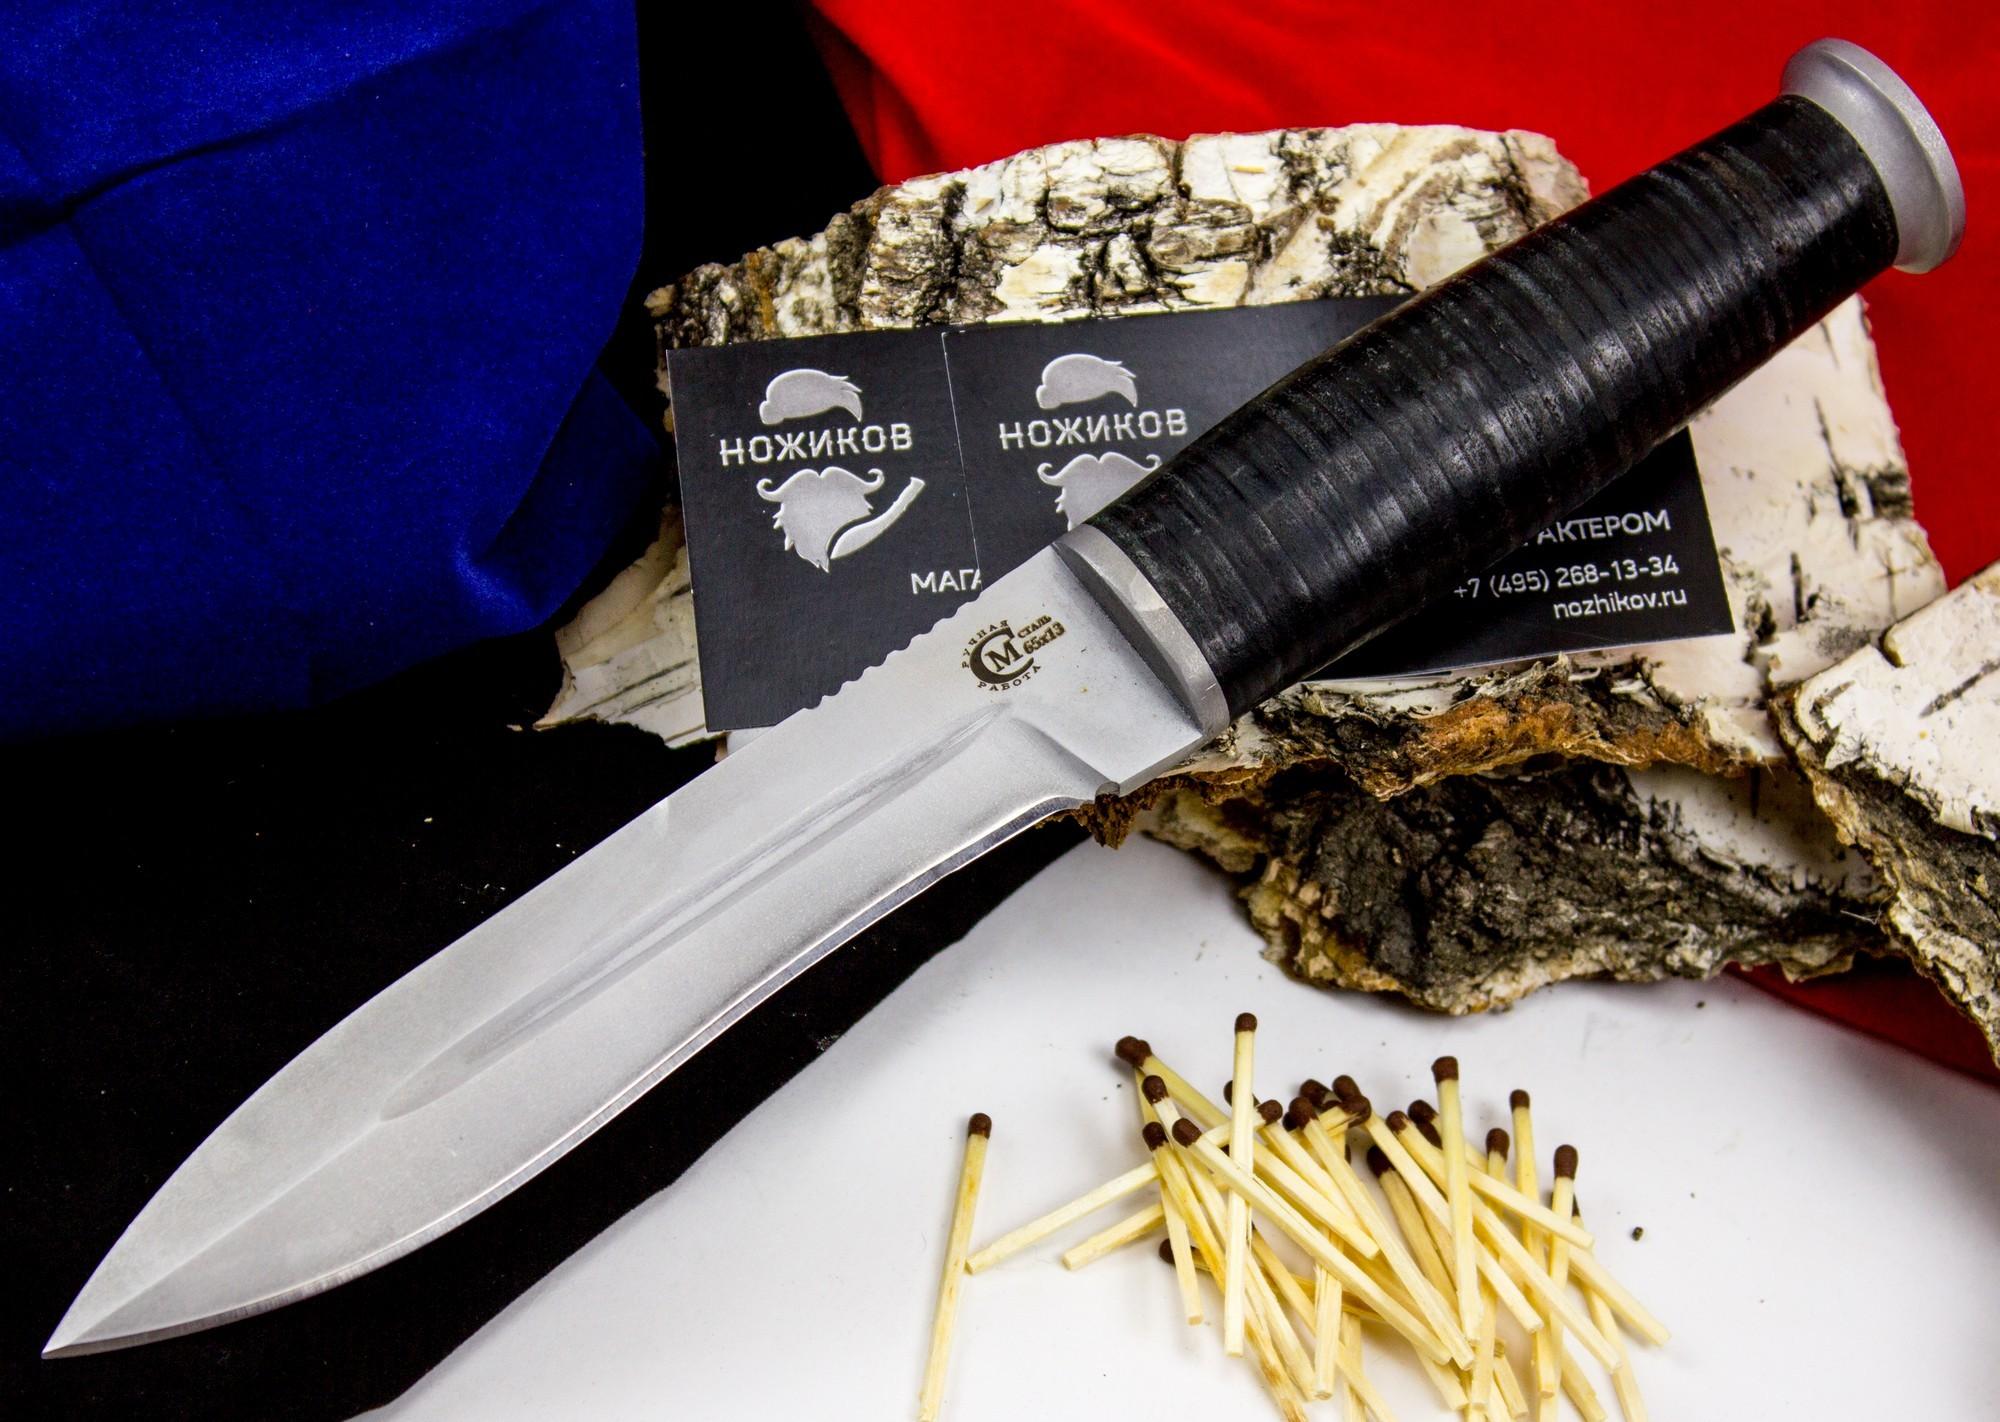 Нож Ермак , сталь 65Х13 нож ермак steelclaw